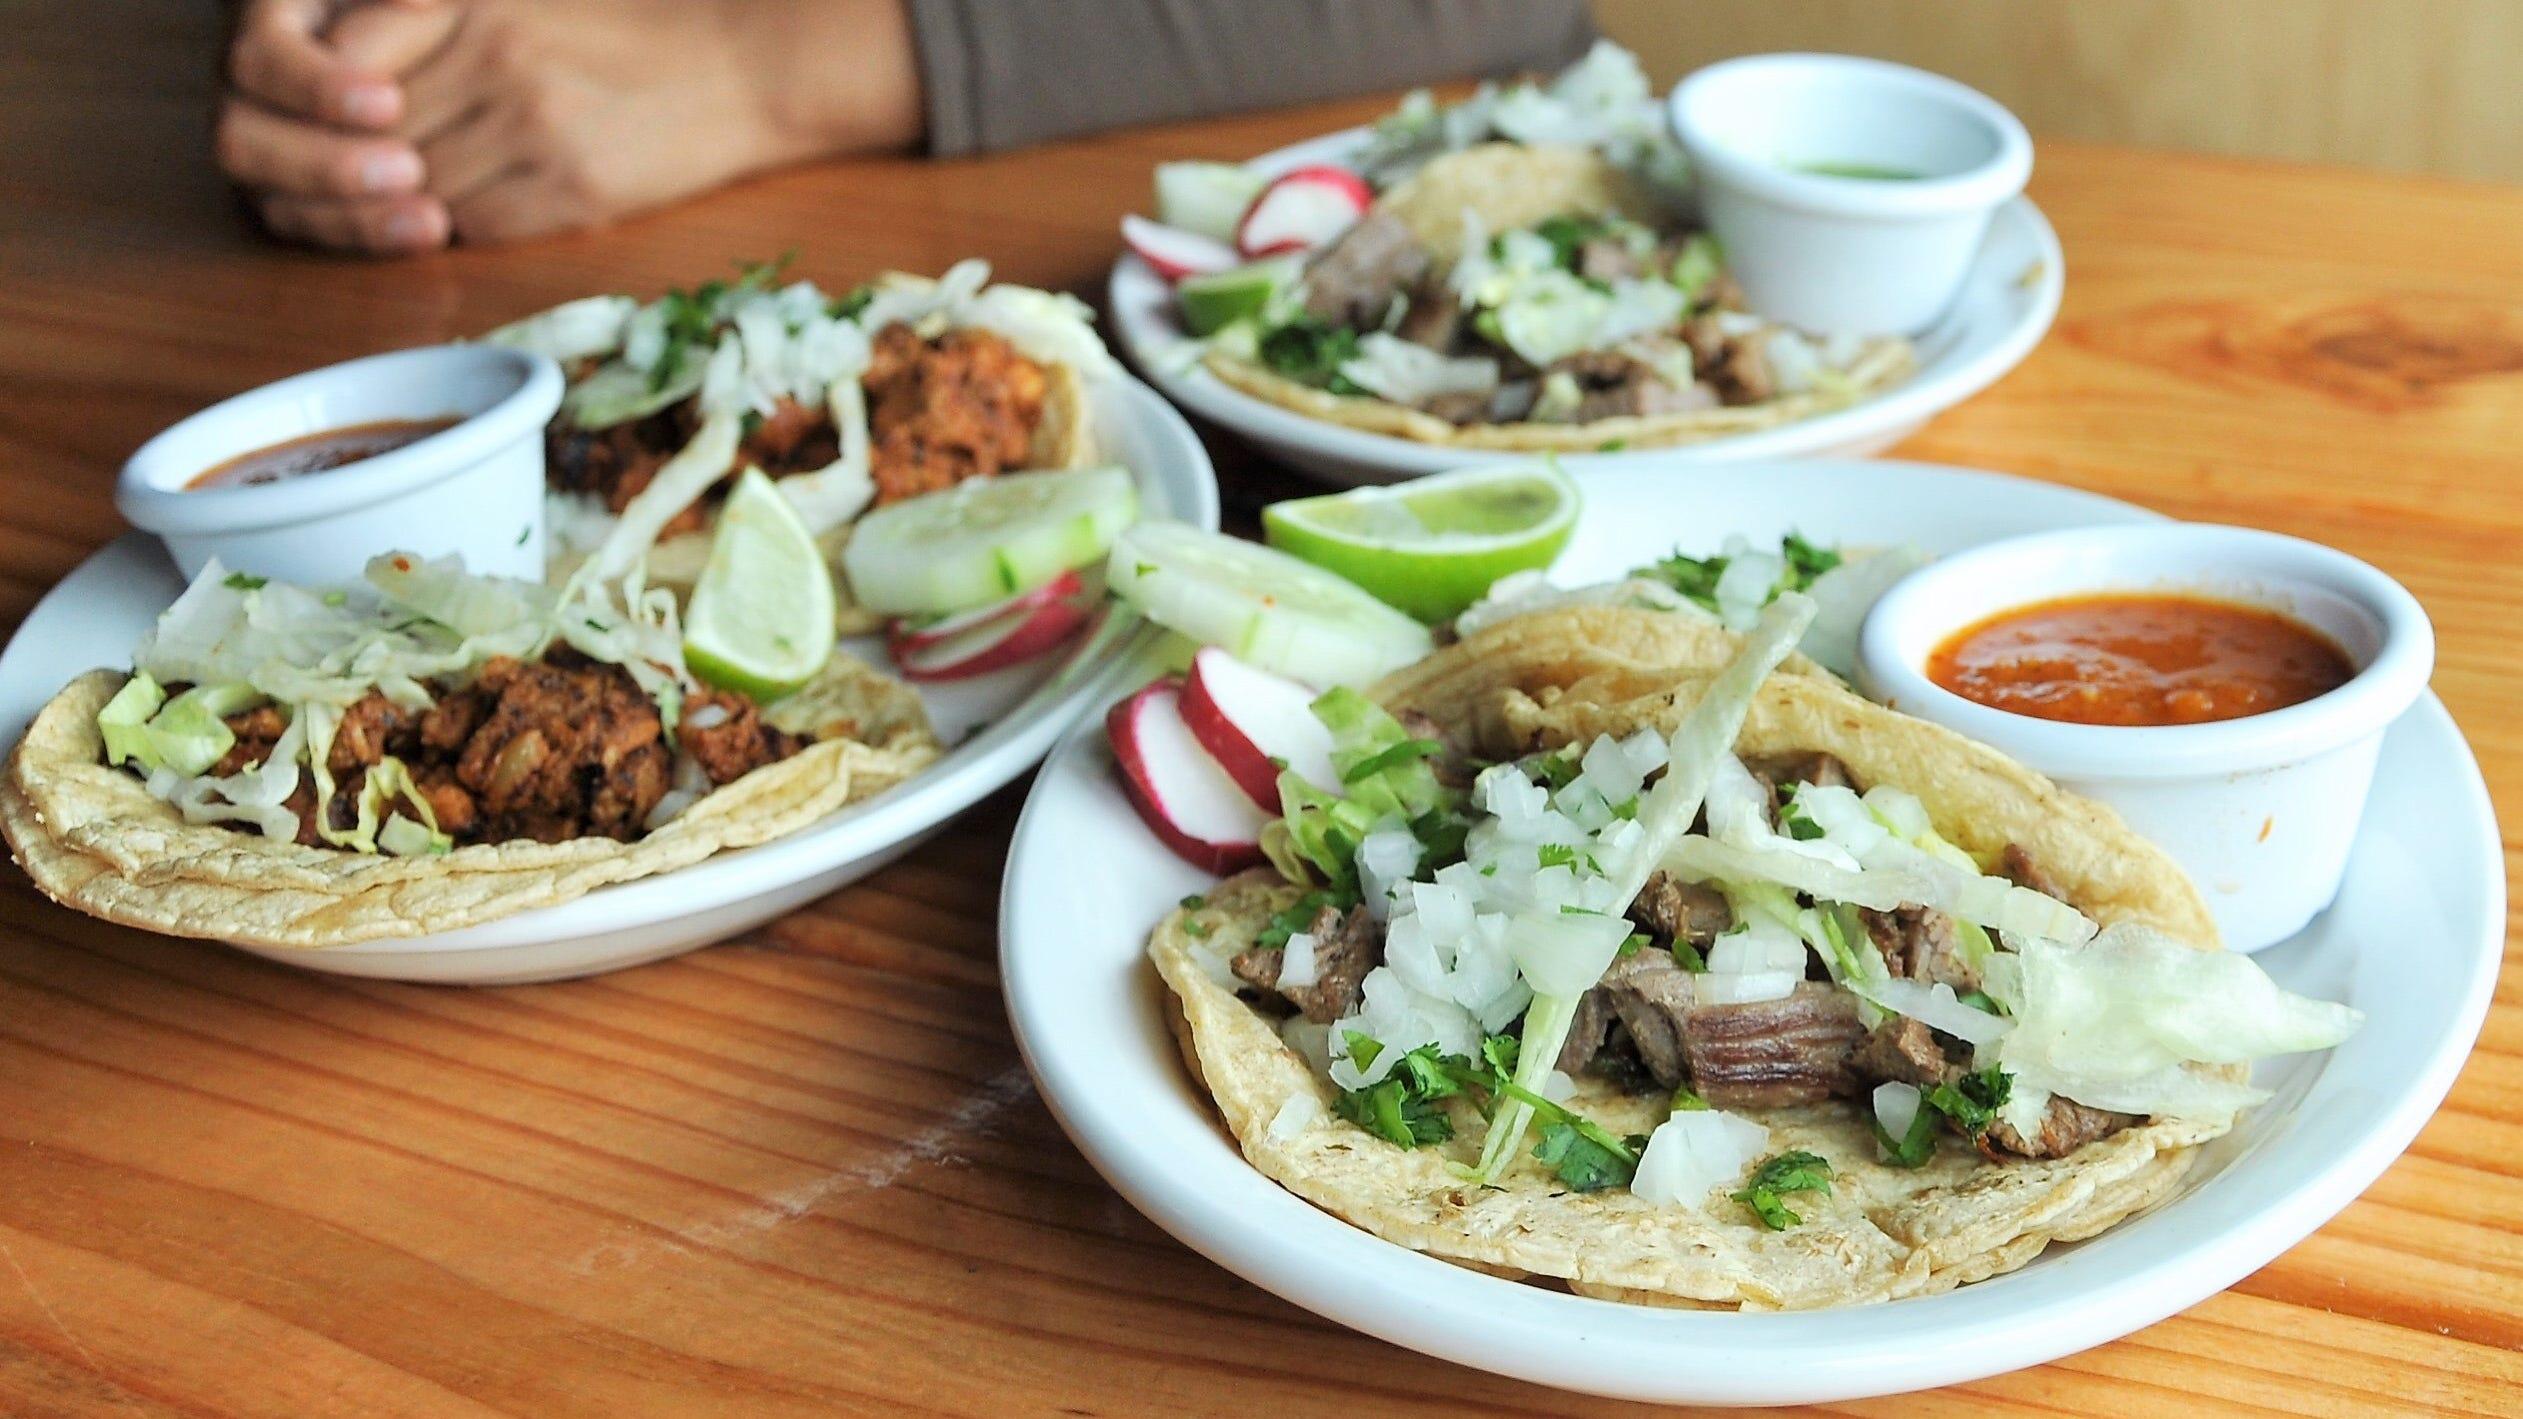 Loren & Mari will serve al pastor, carne asada and shrimp and fish tacos.